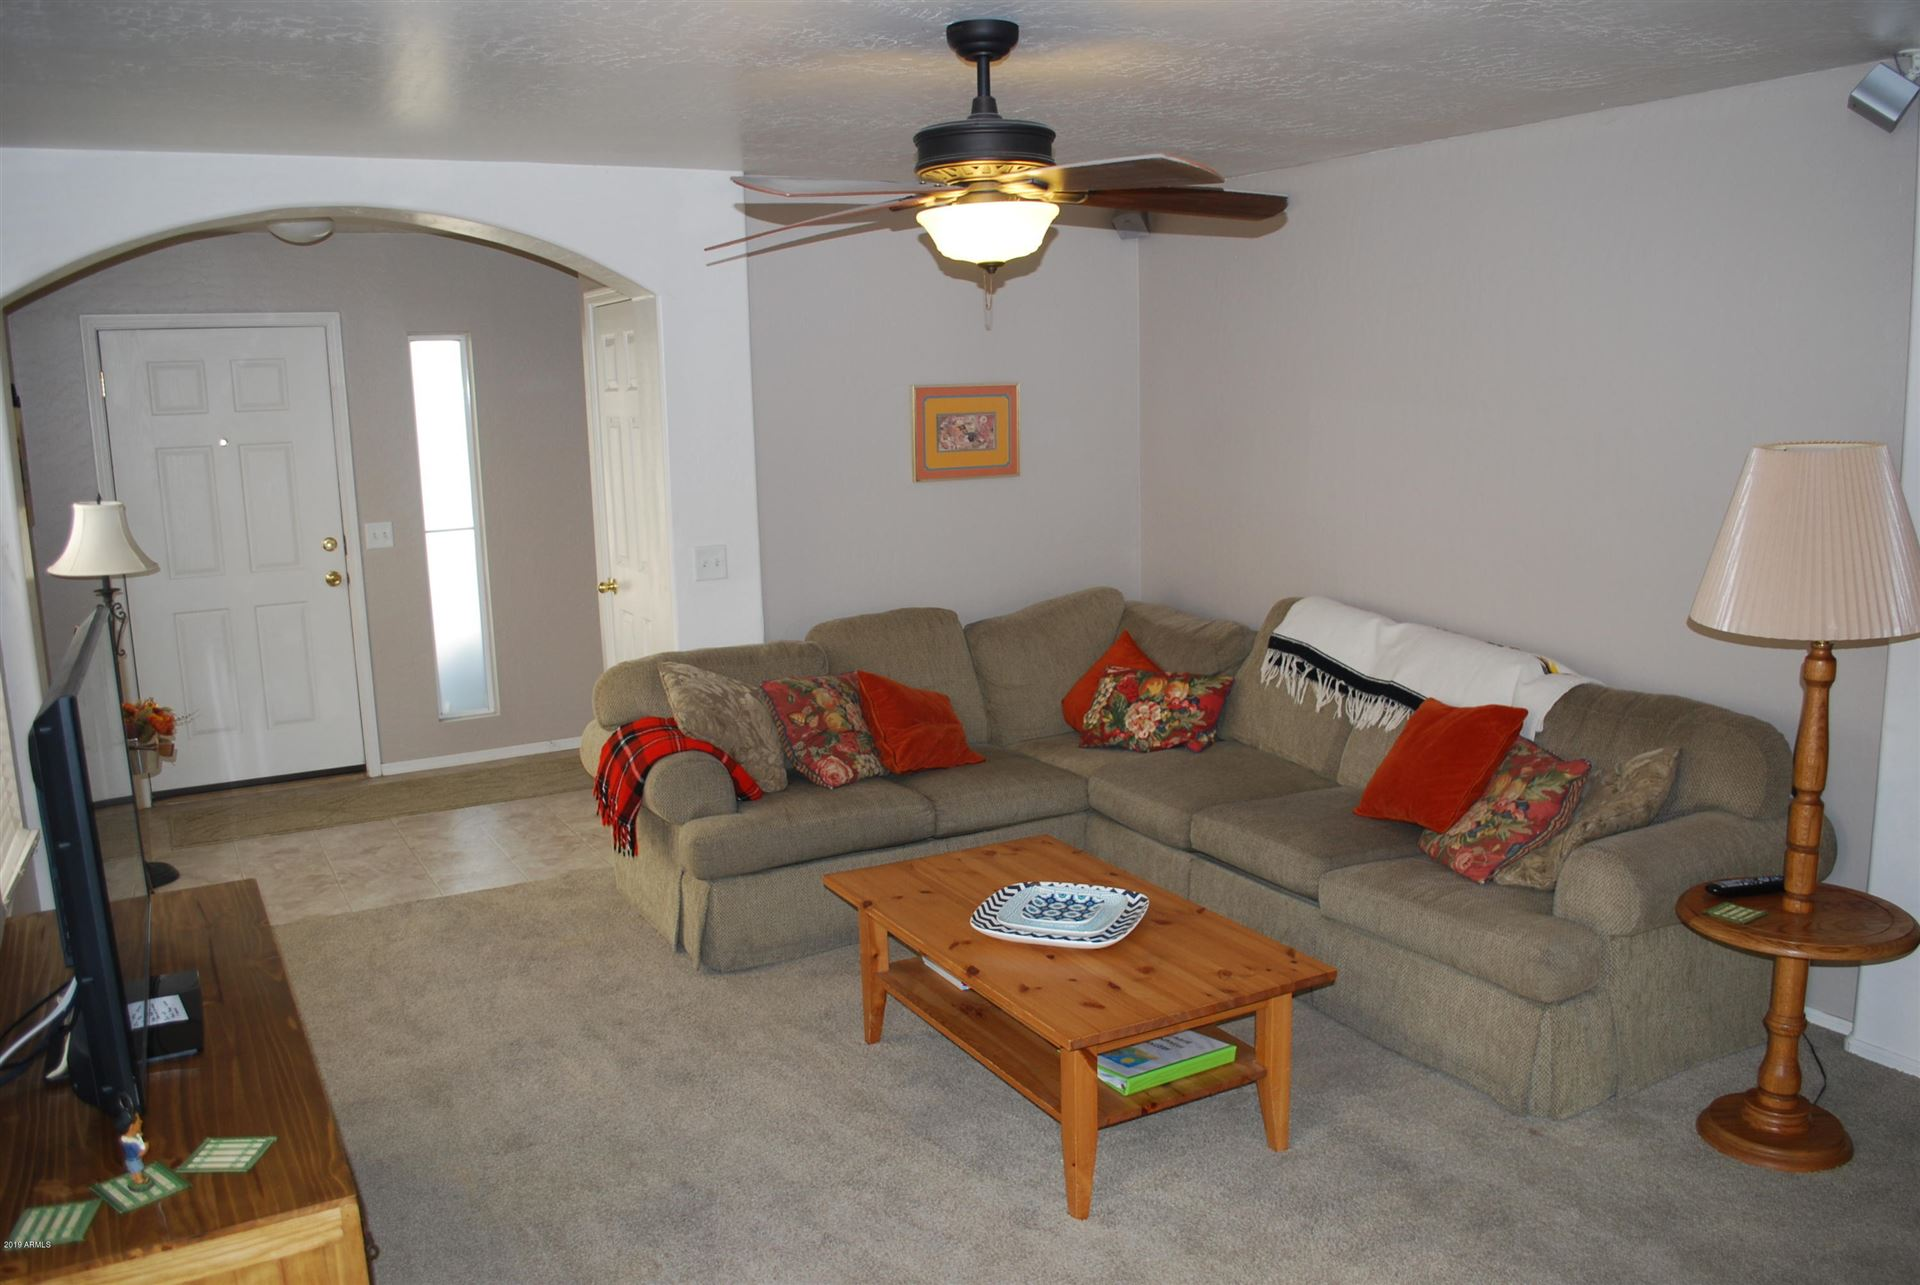 Photo of 13449 W RHINE Lane, Litchfield Park, AZ 85340 (MLS # 6271021)